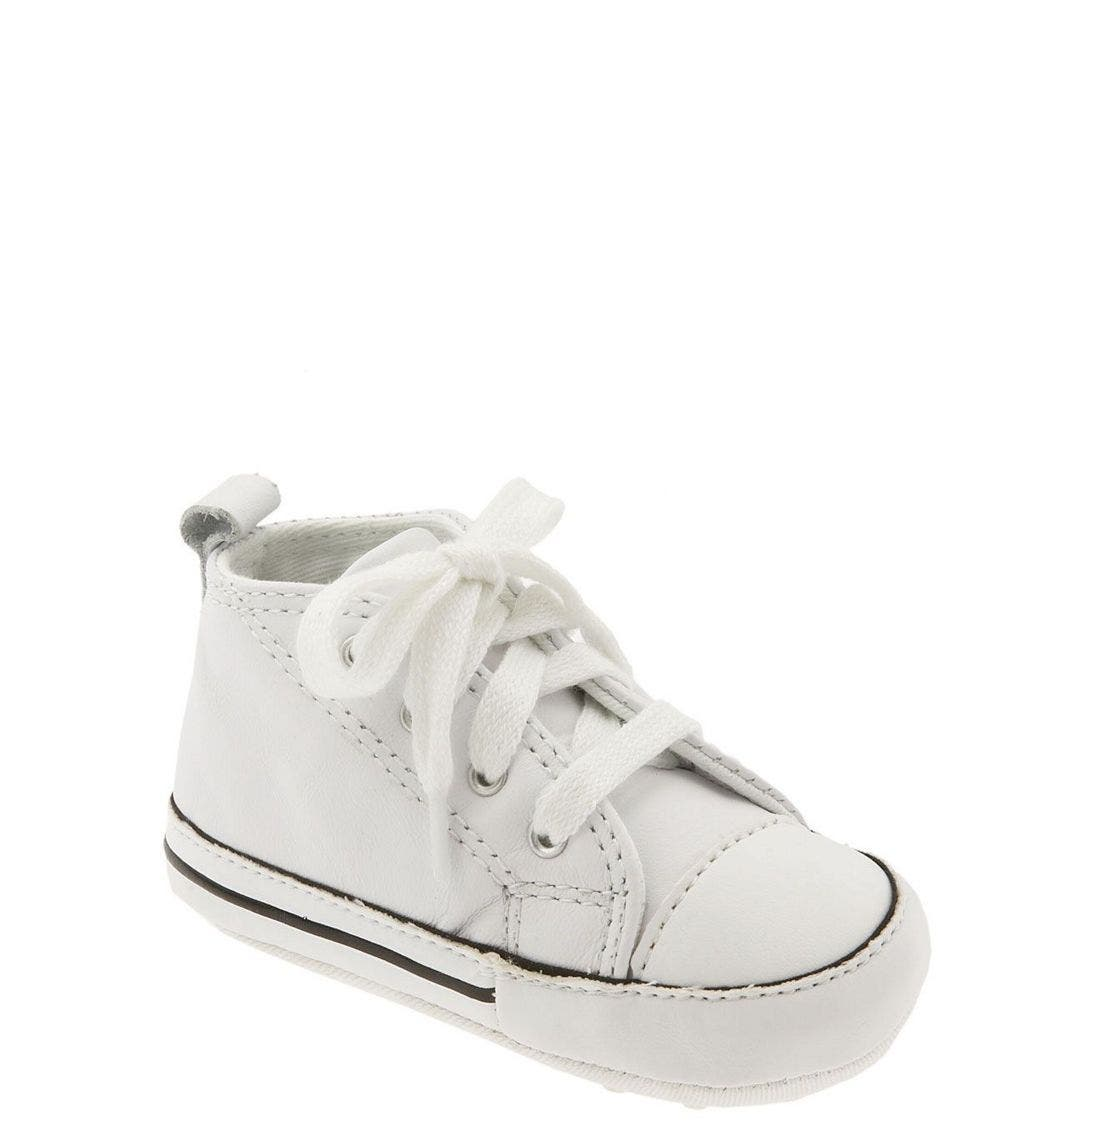 Alternate Image 1 Selected - Converse Chuck Taylor® Crib Sneaker (Baby)